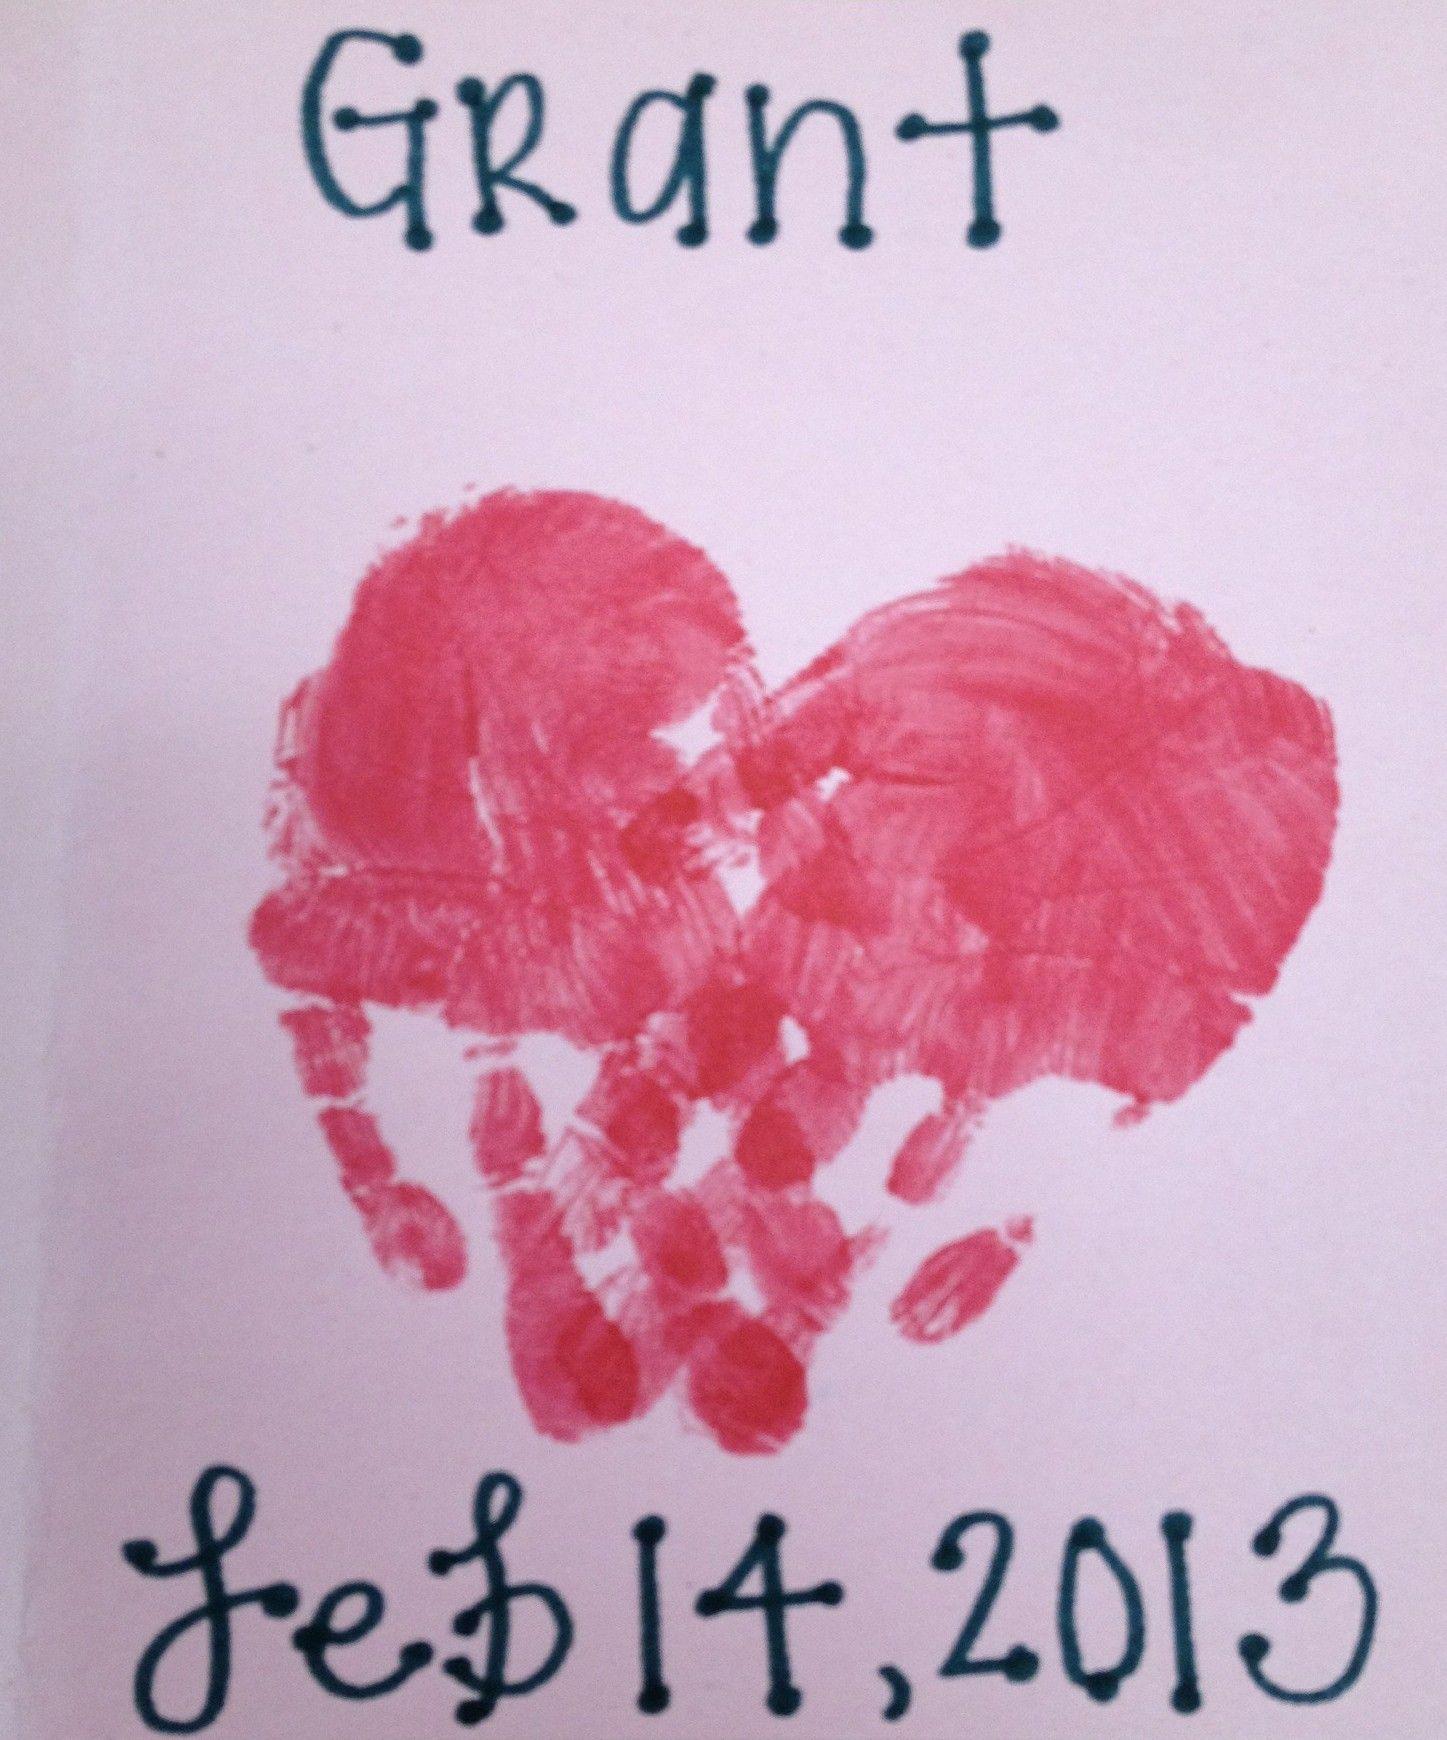 John 3 16 Valentine S Day Card